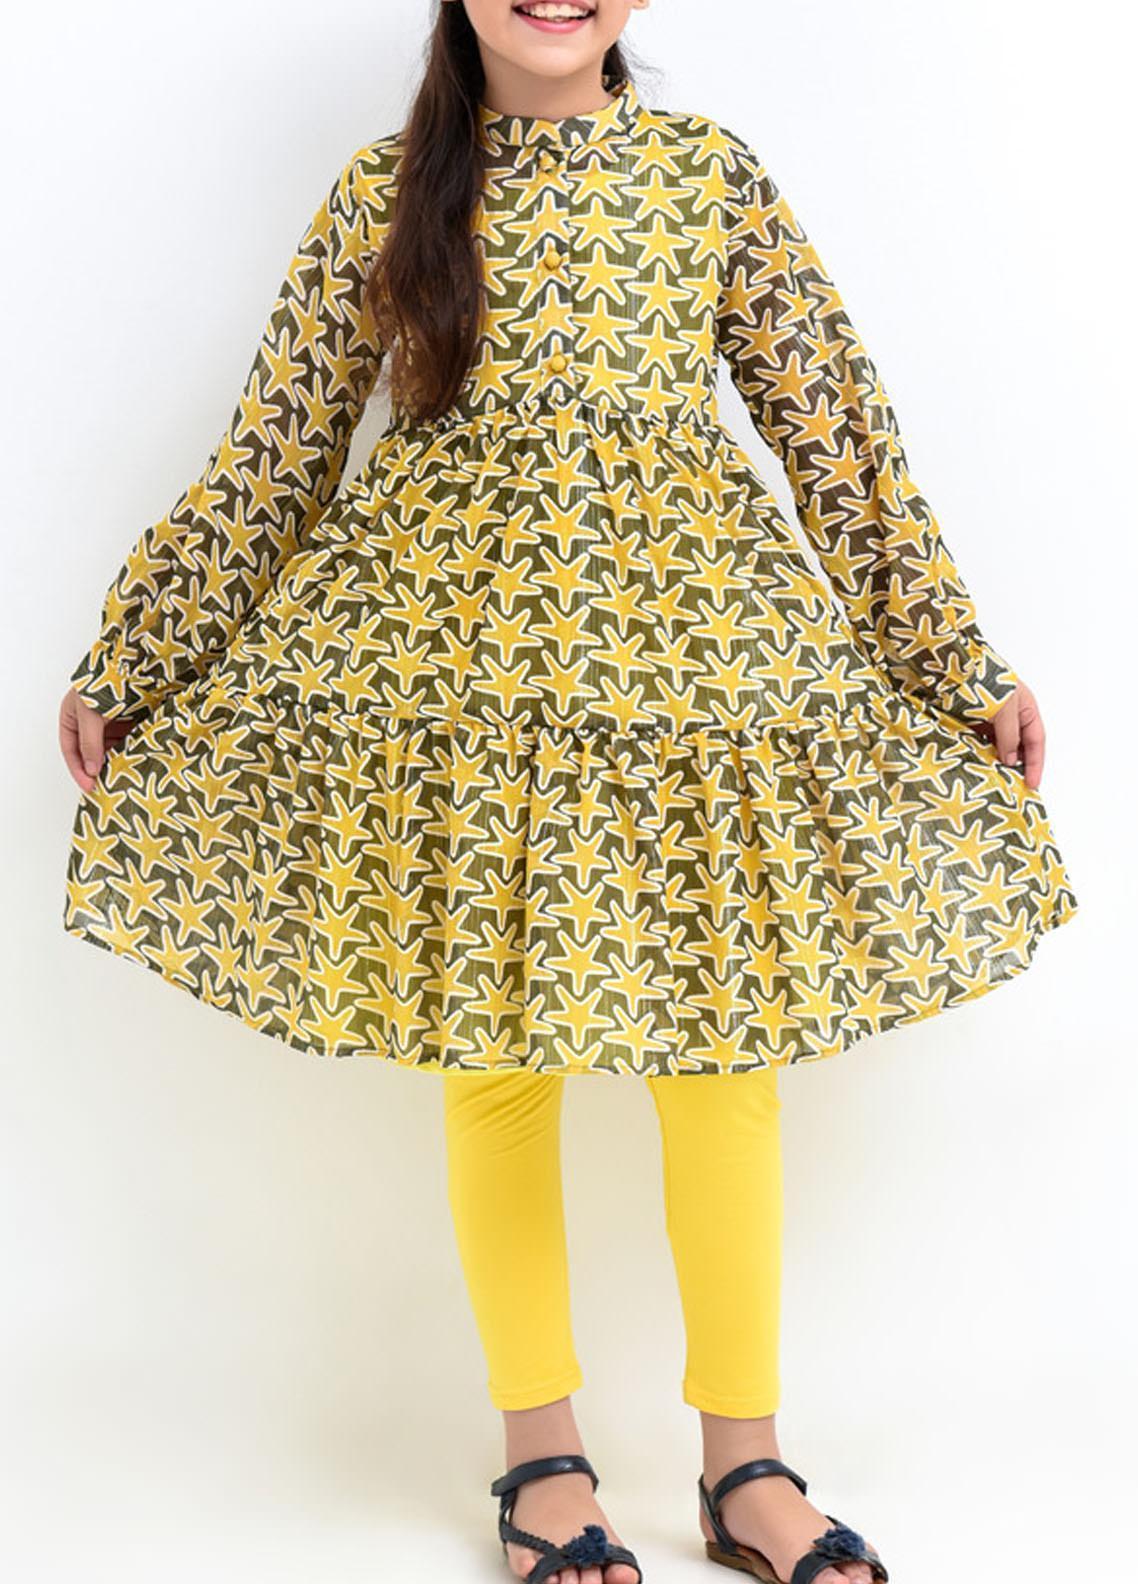 Ochre Chiffon Western Girls Western Tops - Yellow OWT 363 Yellow